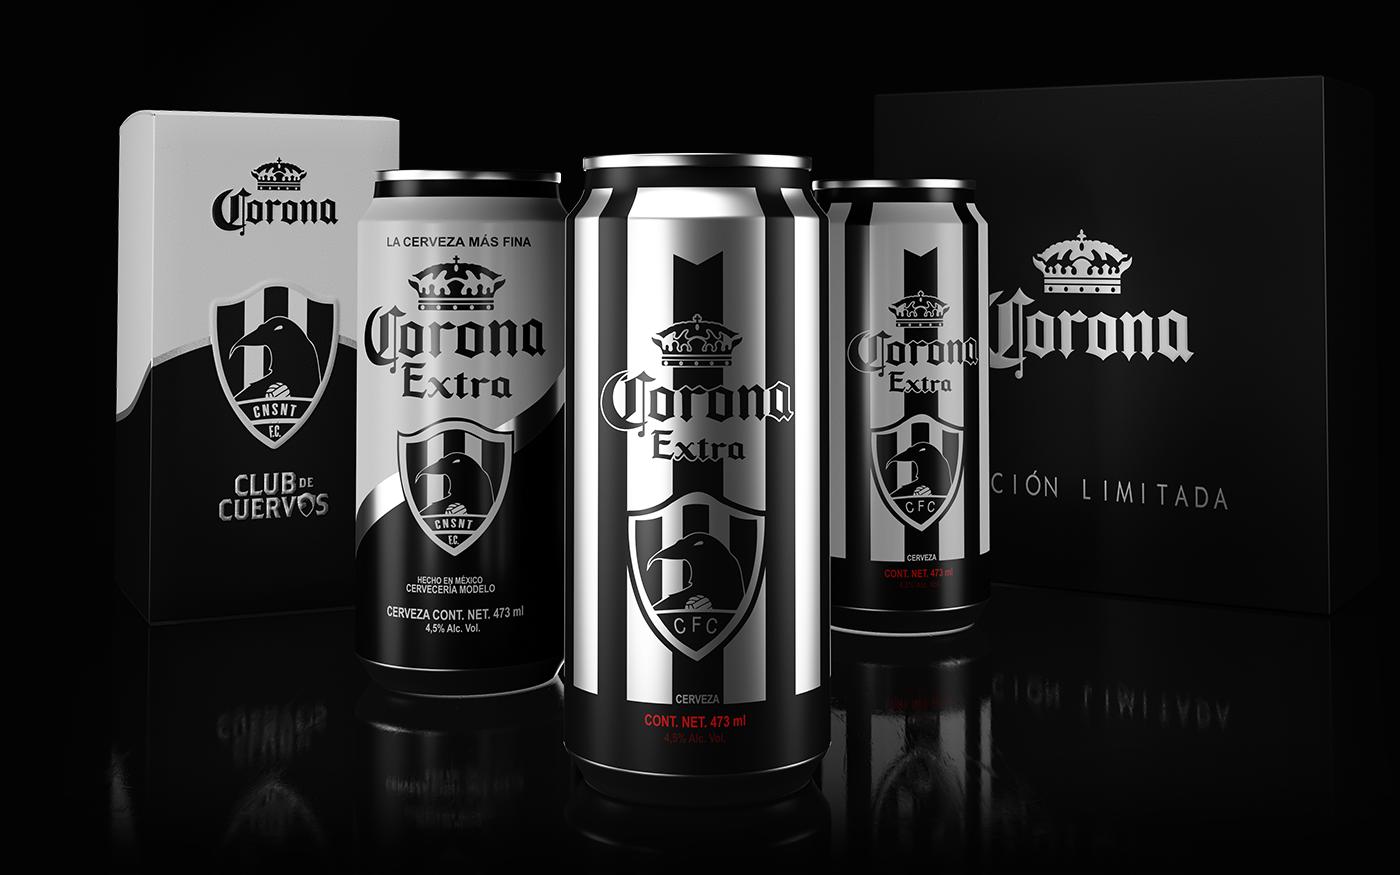 3D CGI ad campaign beer soccer football can corona cuervos